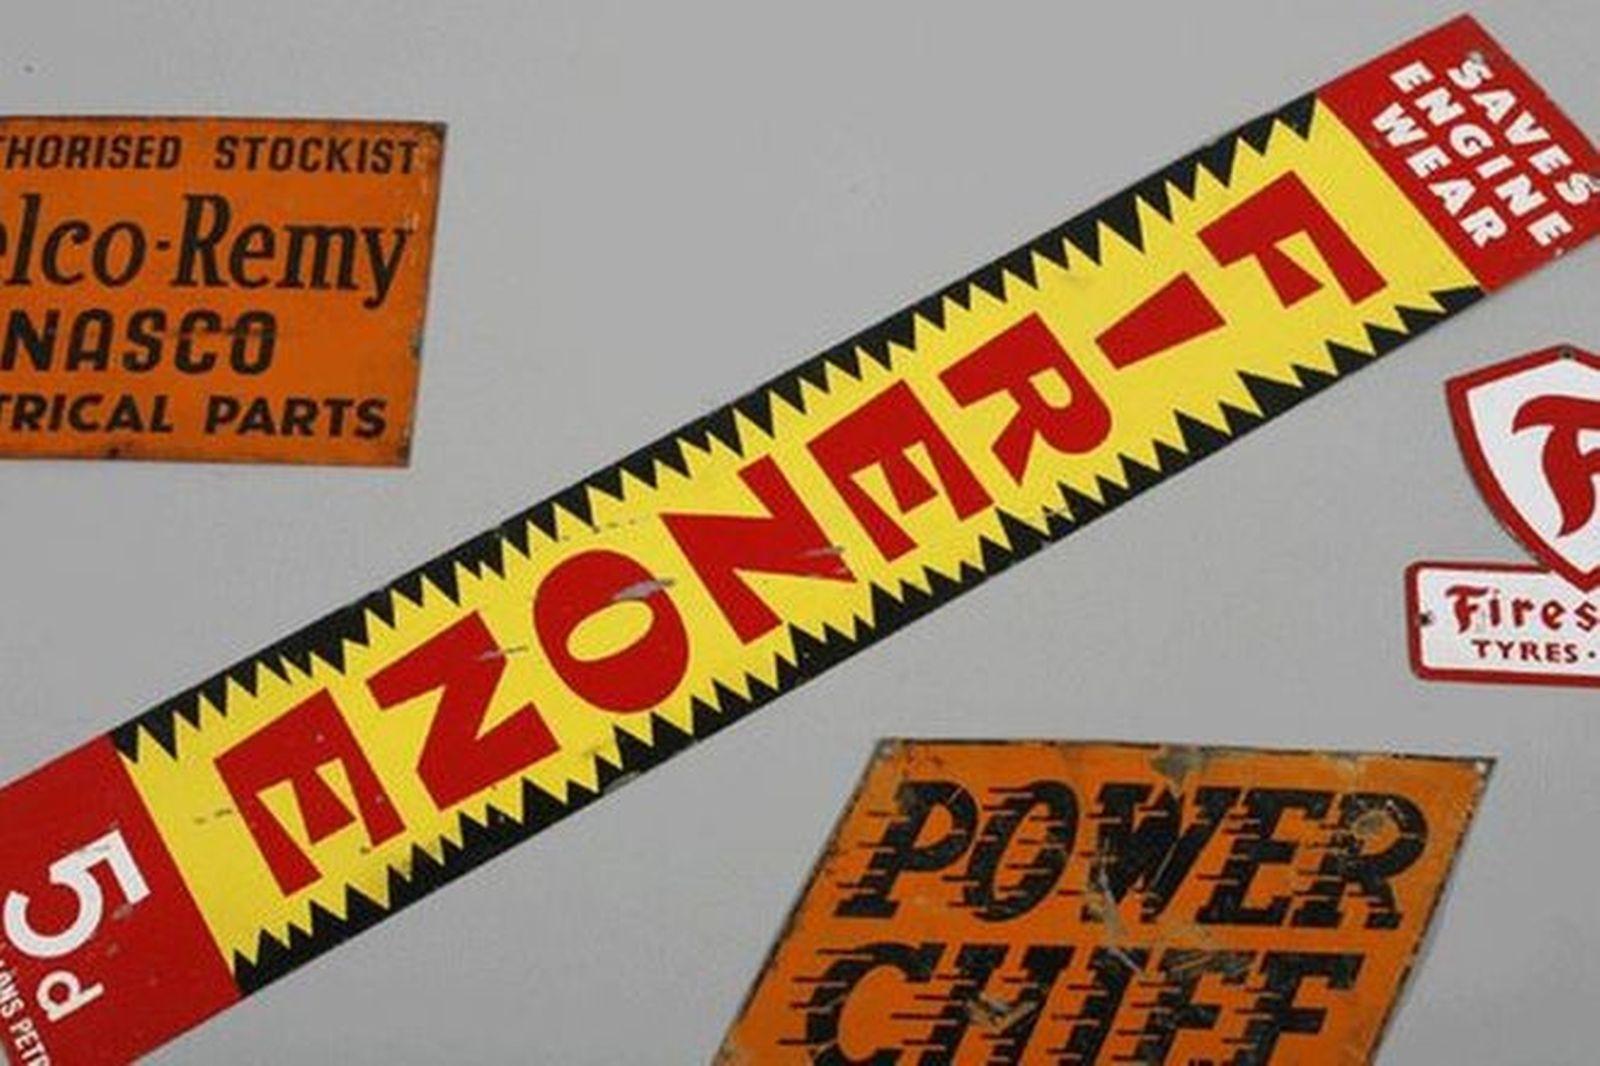 Enamel Signs x 3 - Delco Remy, Firestone, Power Chief 1 x Tin Sign - Firezone